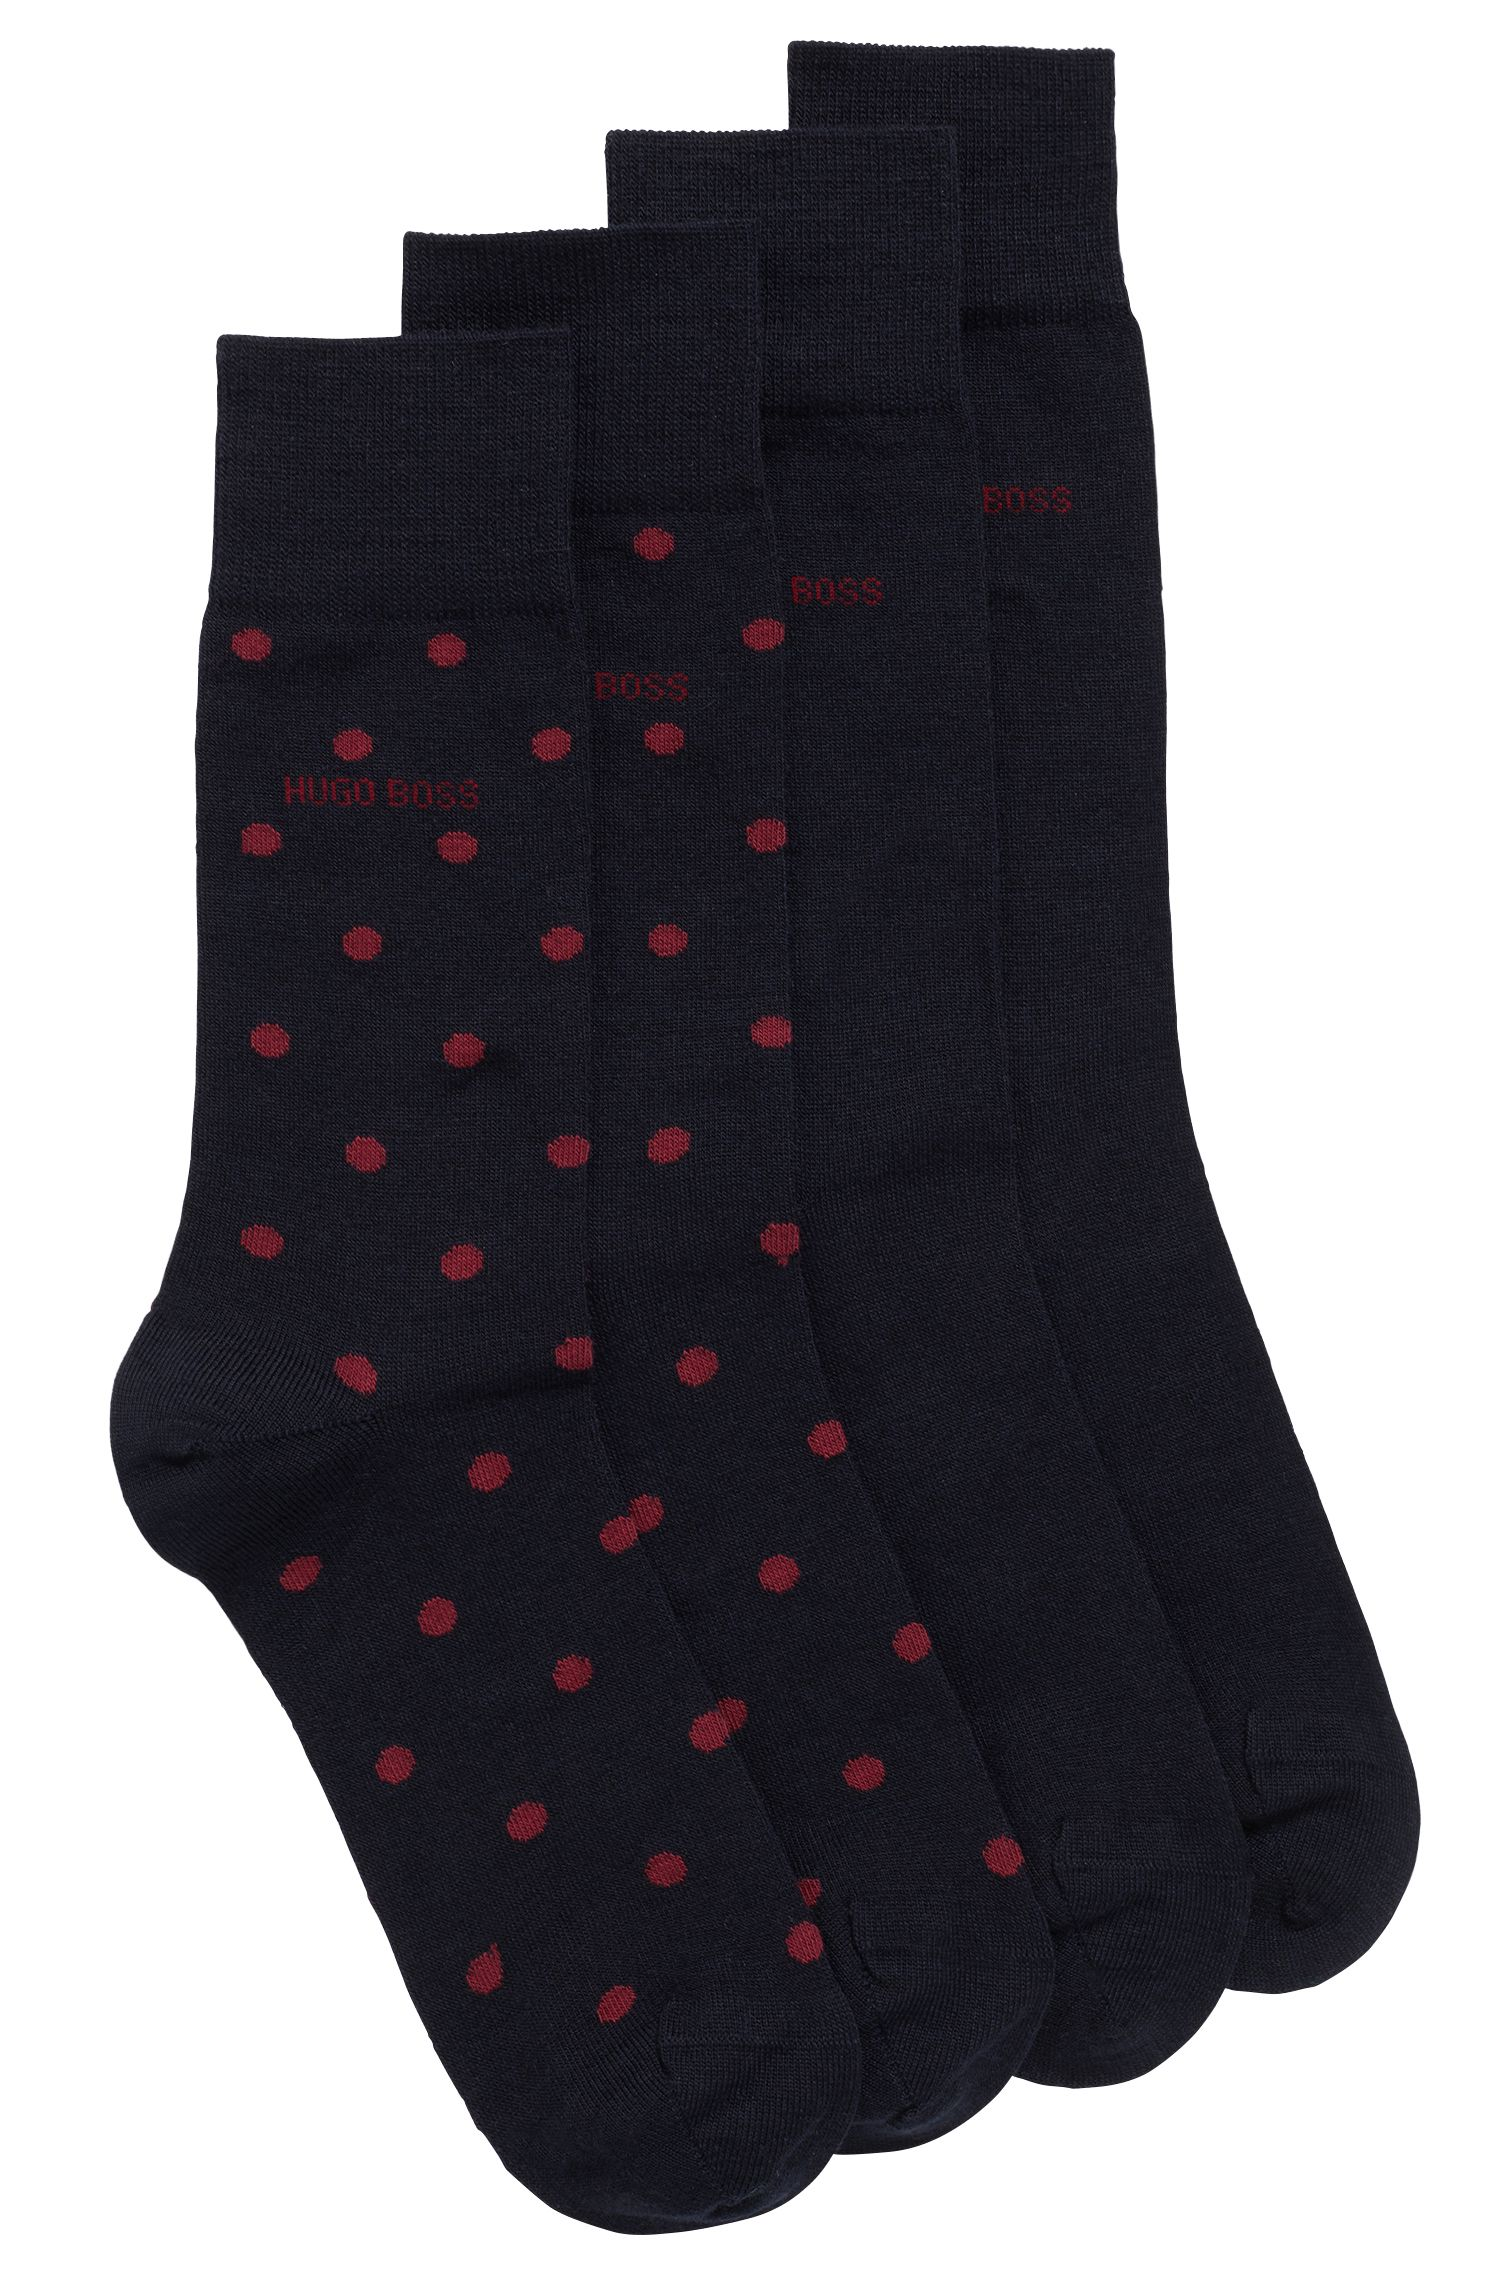 Zweier-Pack mittelhohe Socken aus Merinowoll-Mix, Dunkelblau